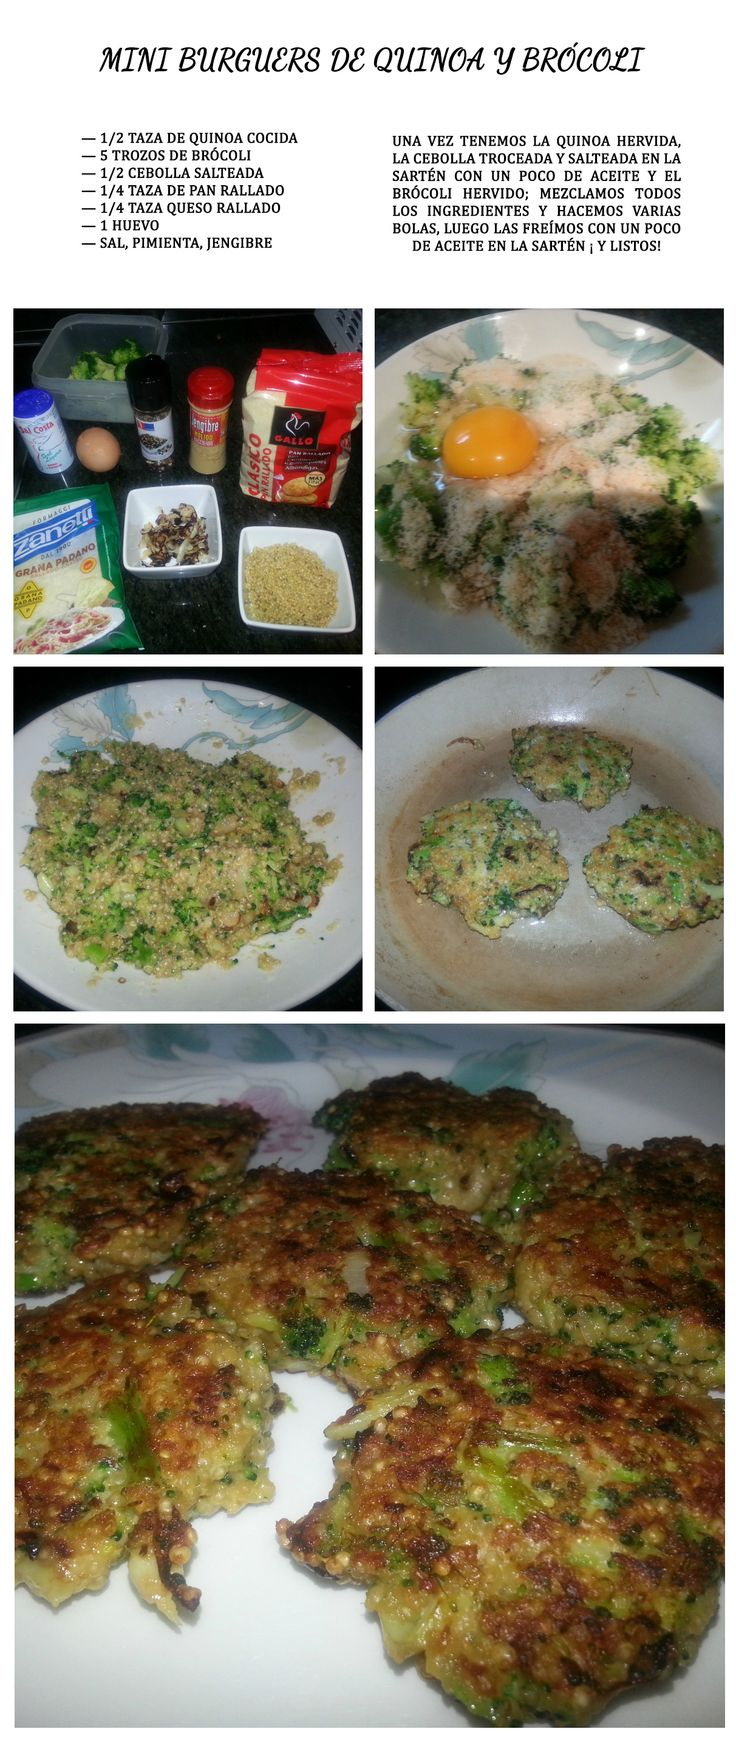 Mini burguers de quinoa y brócoli~  #quinoa #brocoli #vegano #vegetariano #ecologico